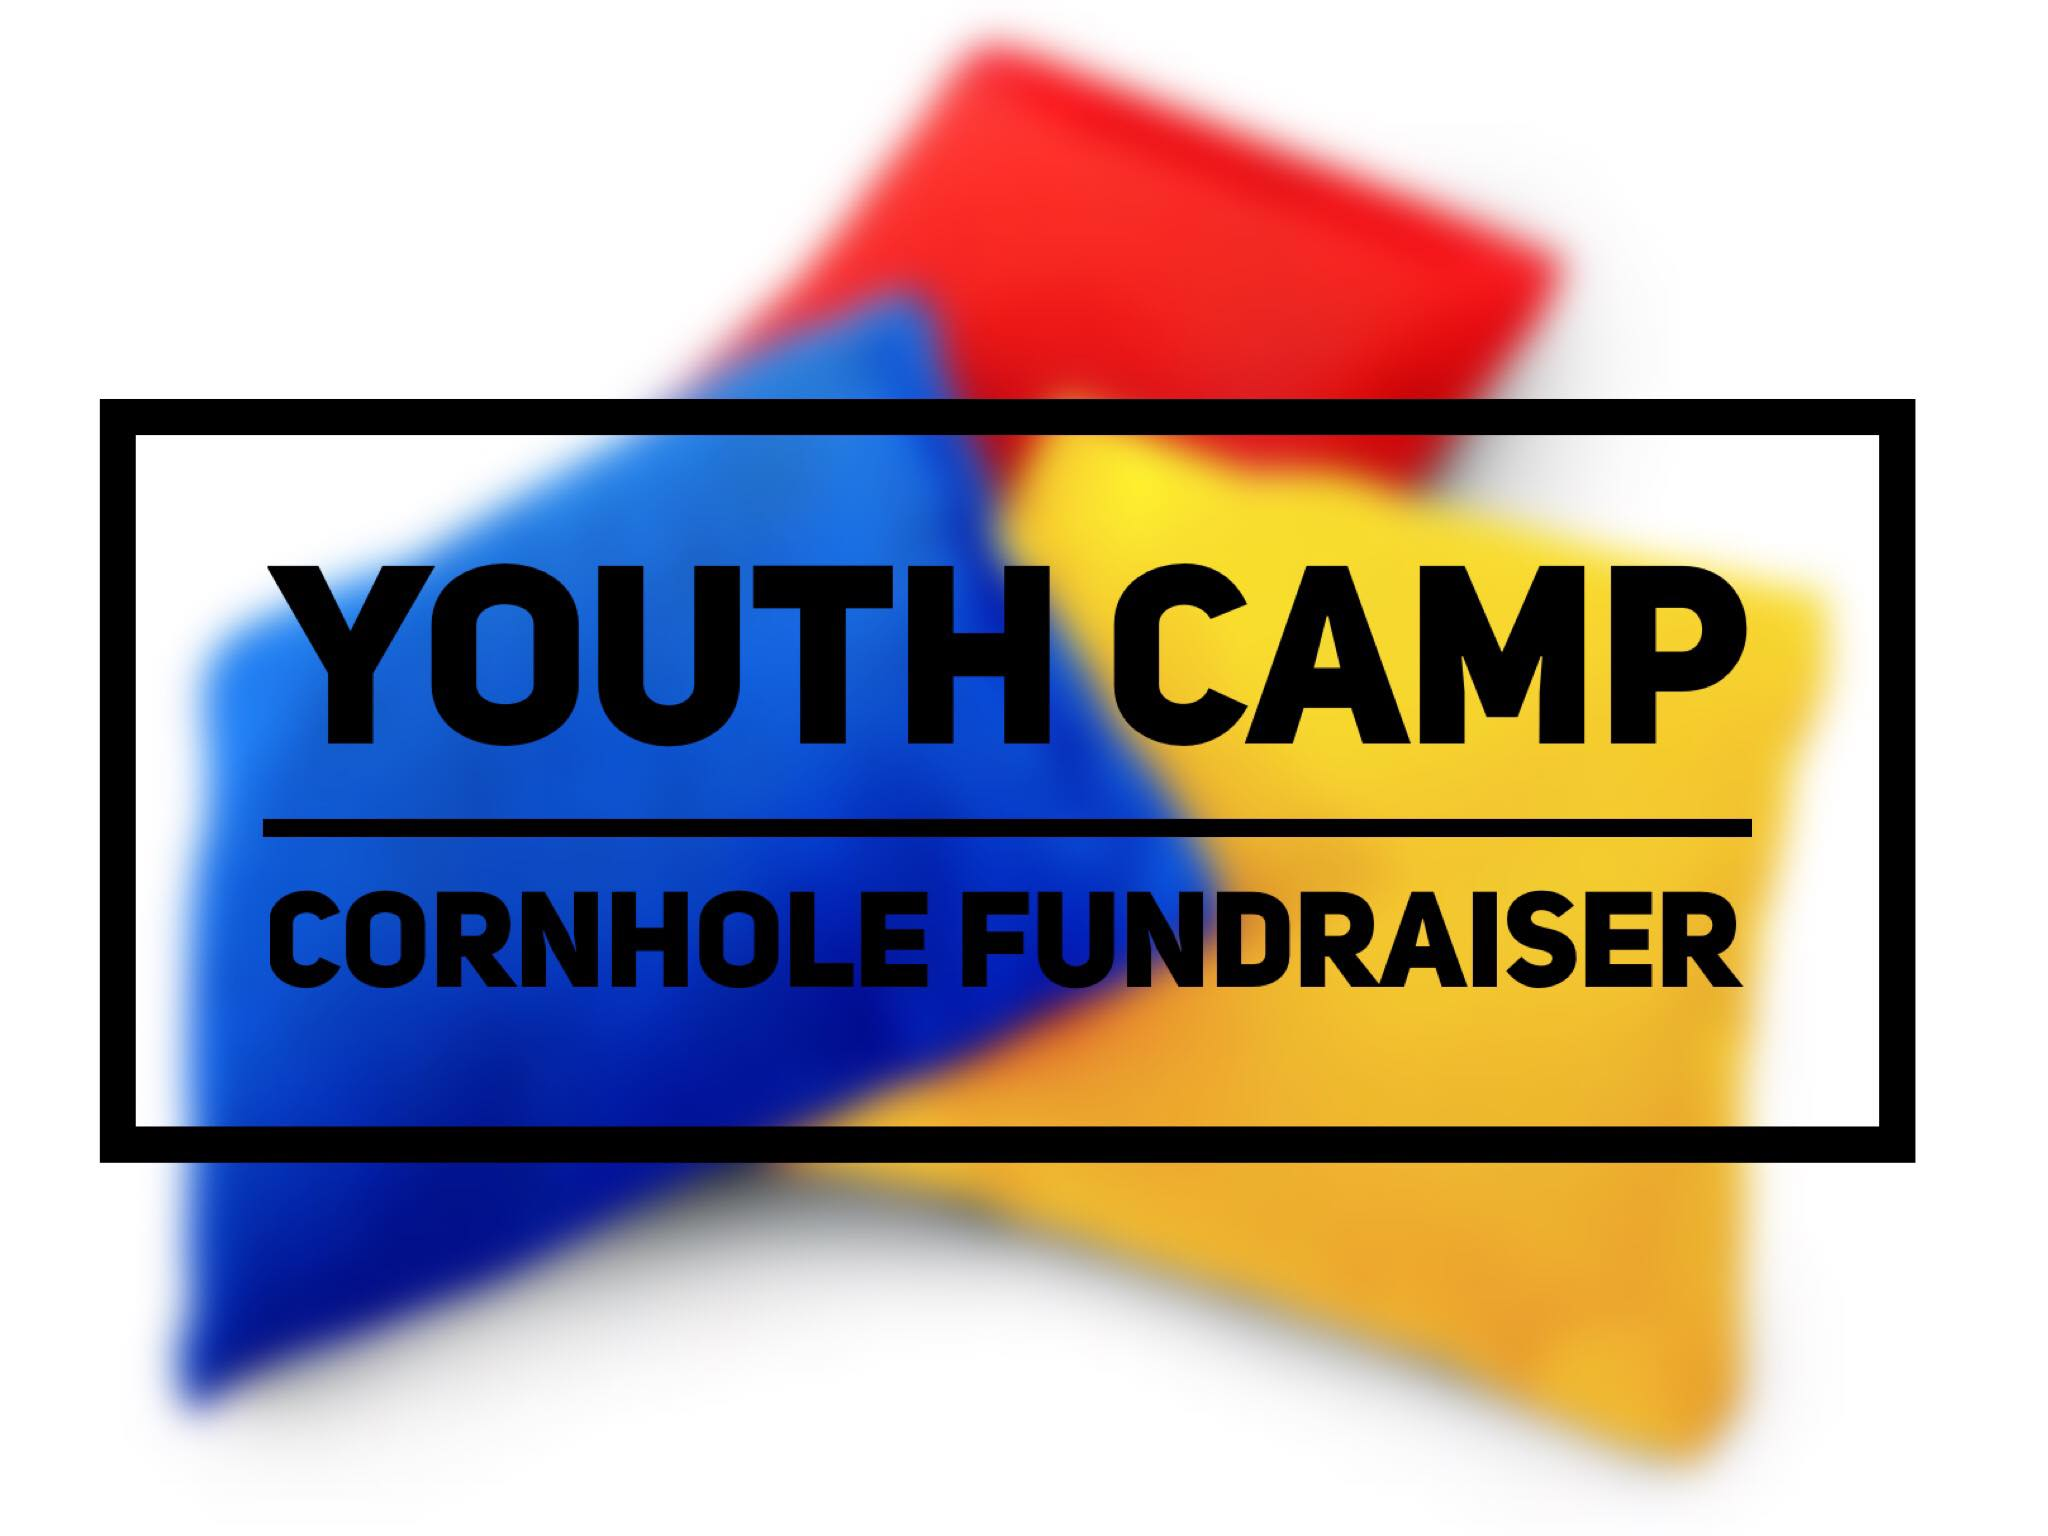 Youth Cornhole Fundraiser